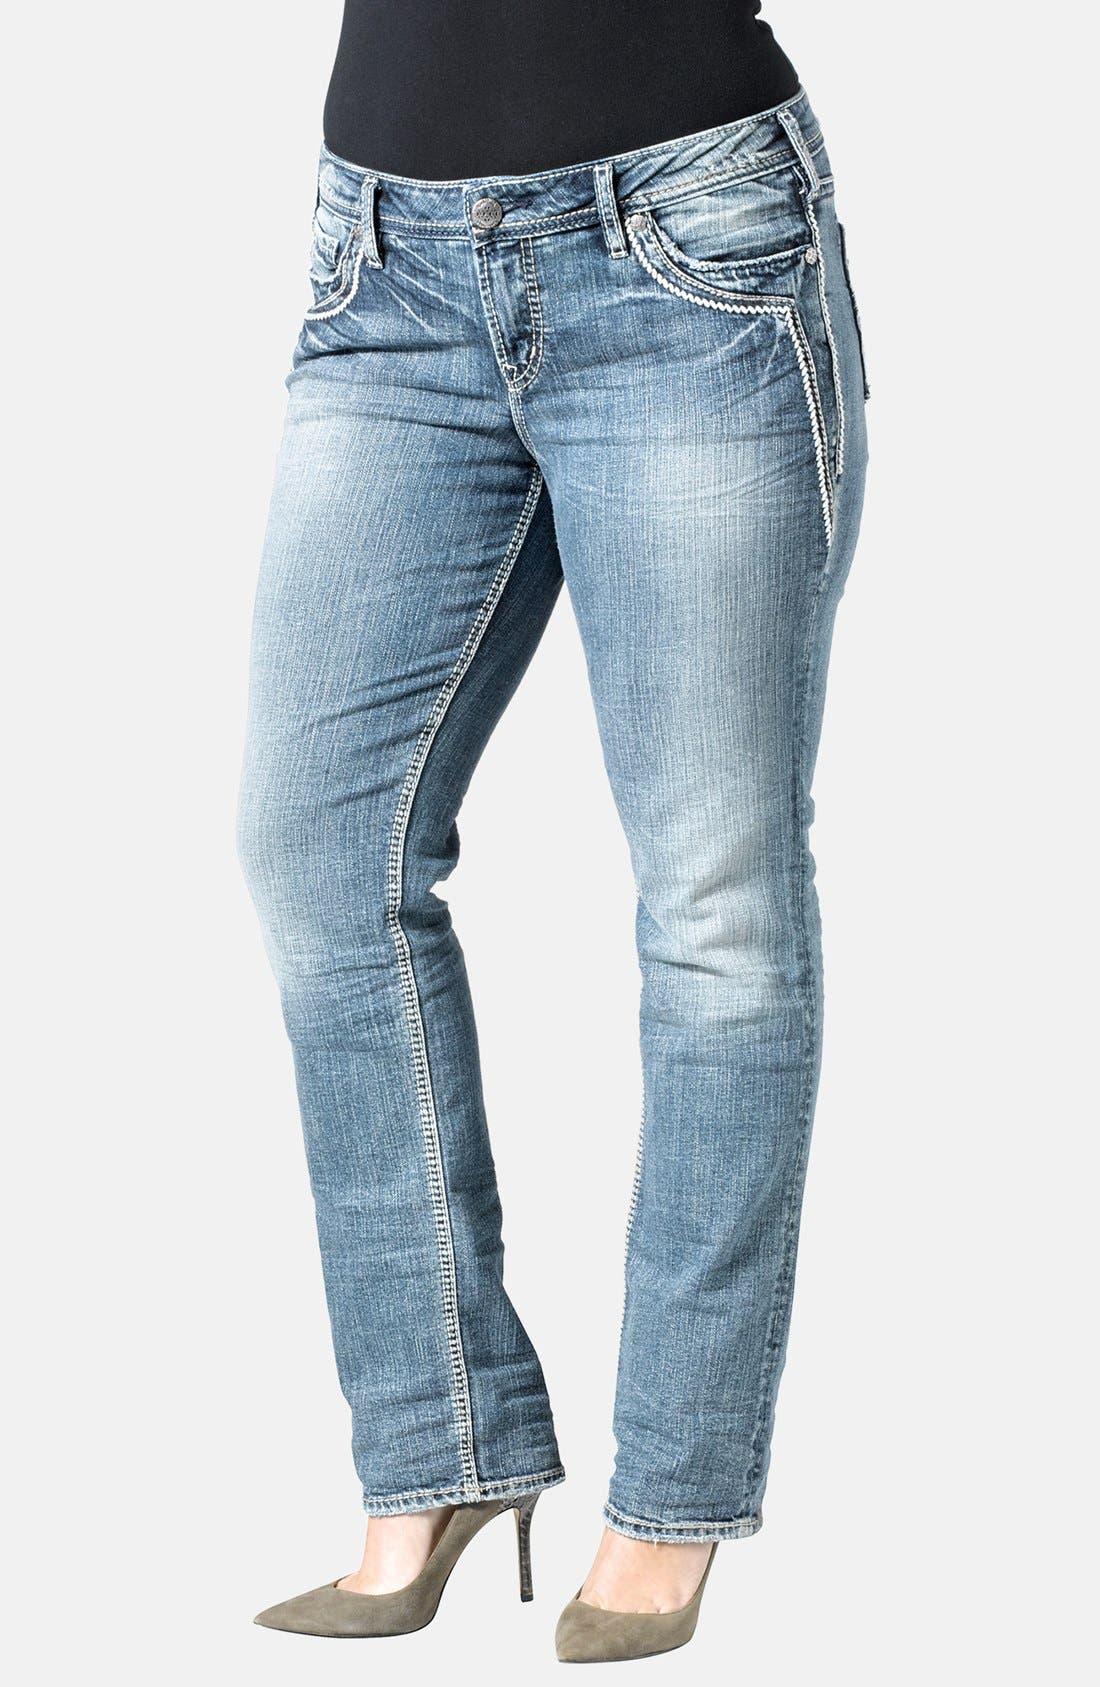 Alternate Image 1 Selected - Silver Jeans Co. 'Aiko' Straight Leg Jeans (Indigo) (Plus Size)